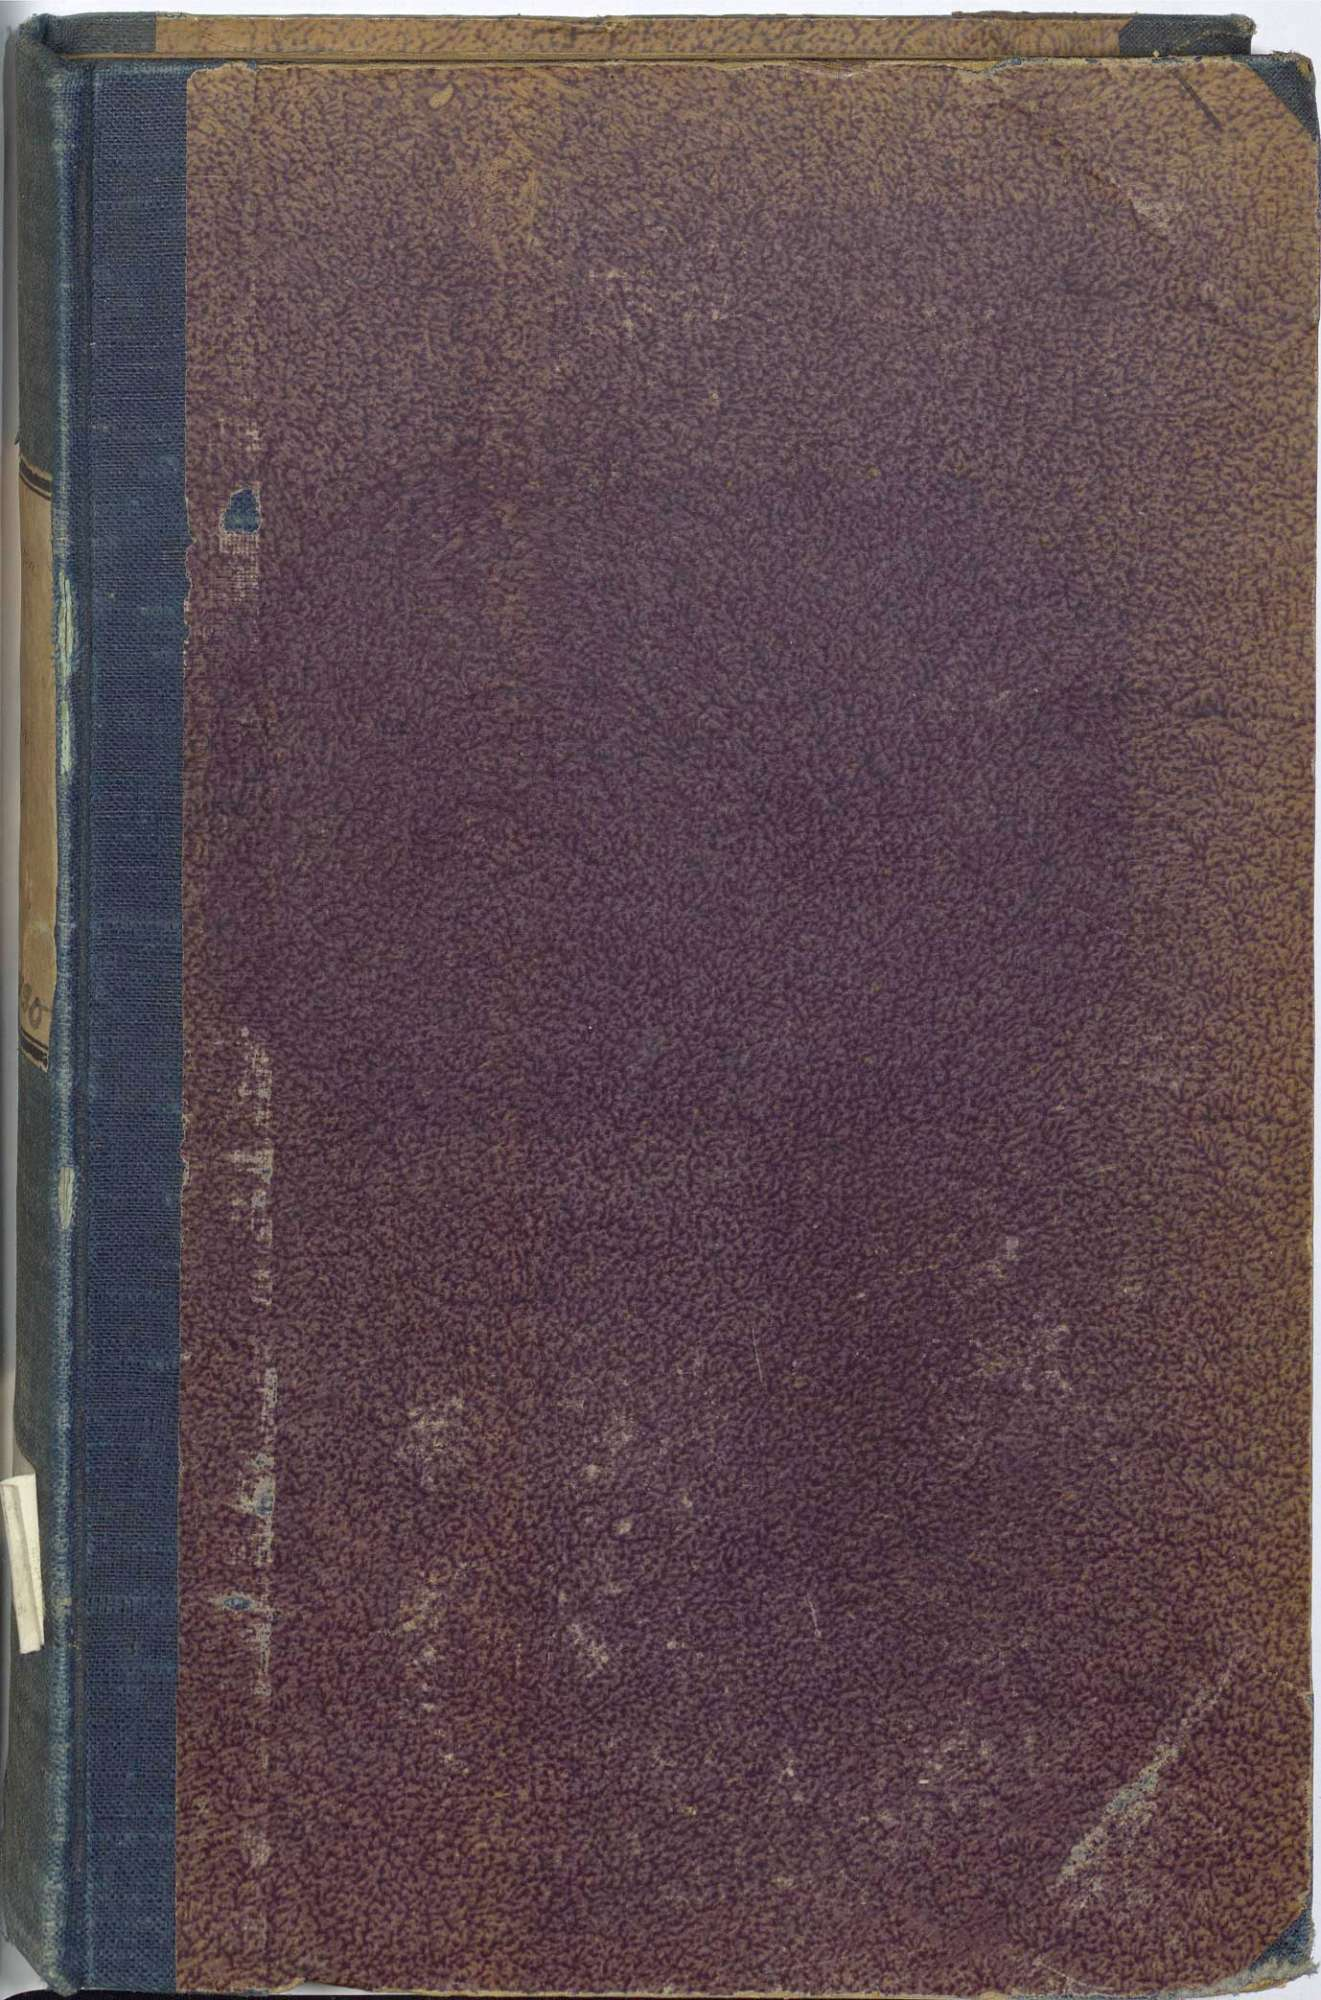 Villingen, Villingen-Schwenningen VS; Katholische Gemeinde: Sterbebuch 1815-1820, Bild 2